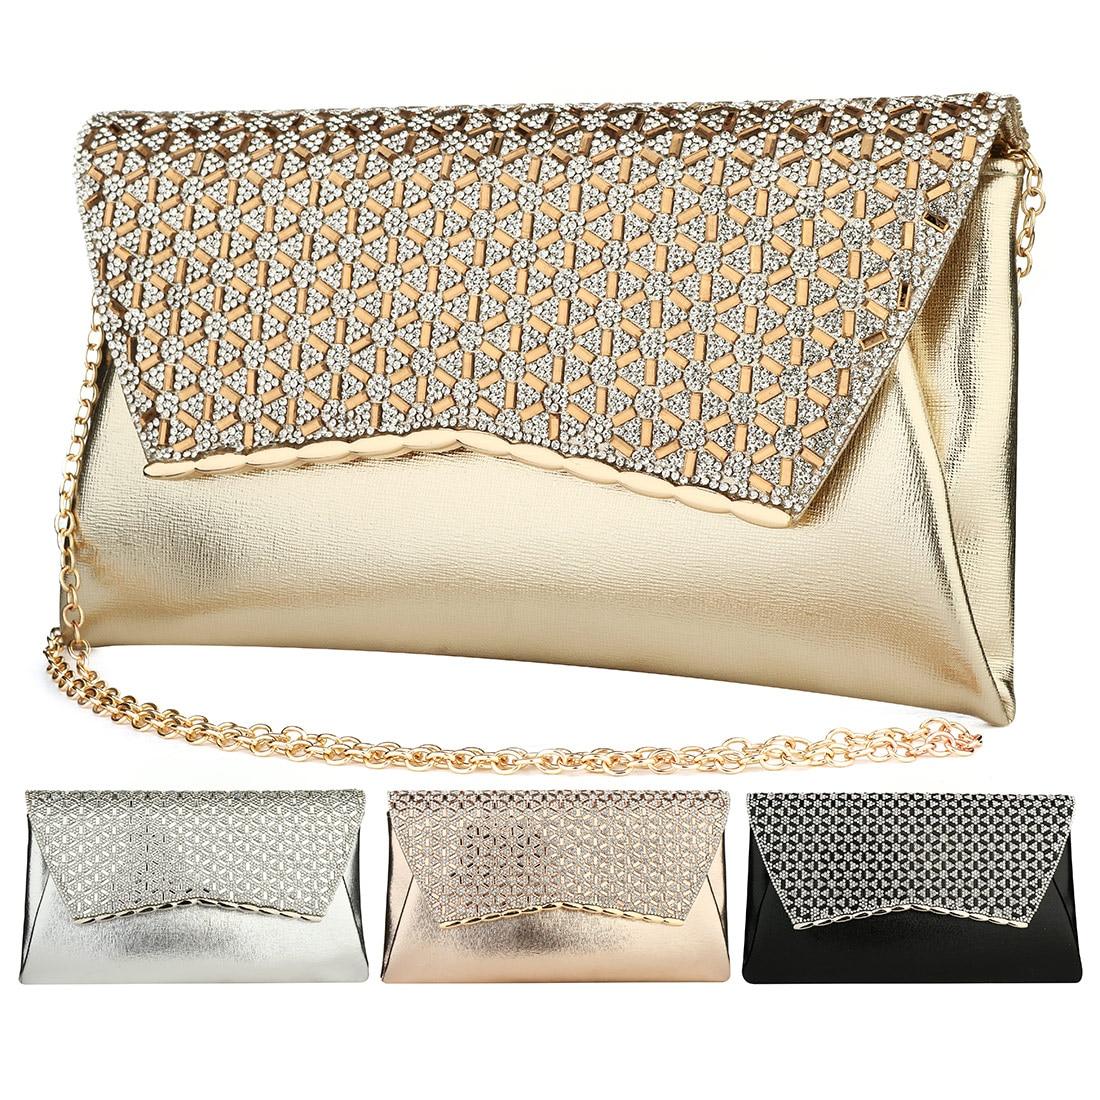 YYW الذهب حقيبة صغيرة حجر الراين الماس حقيبة مسائية مع سلسلة حقائب كروسبودي الإناث مصمم حقيبة زفاف حقيبة براثن كيس